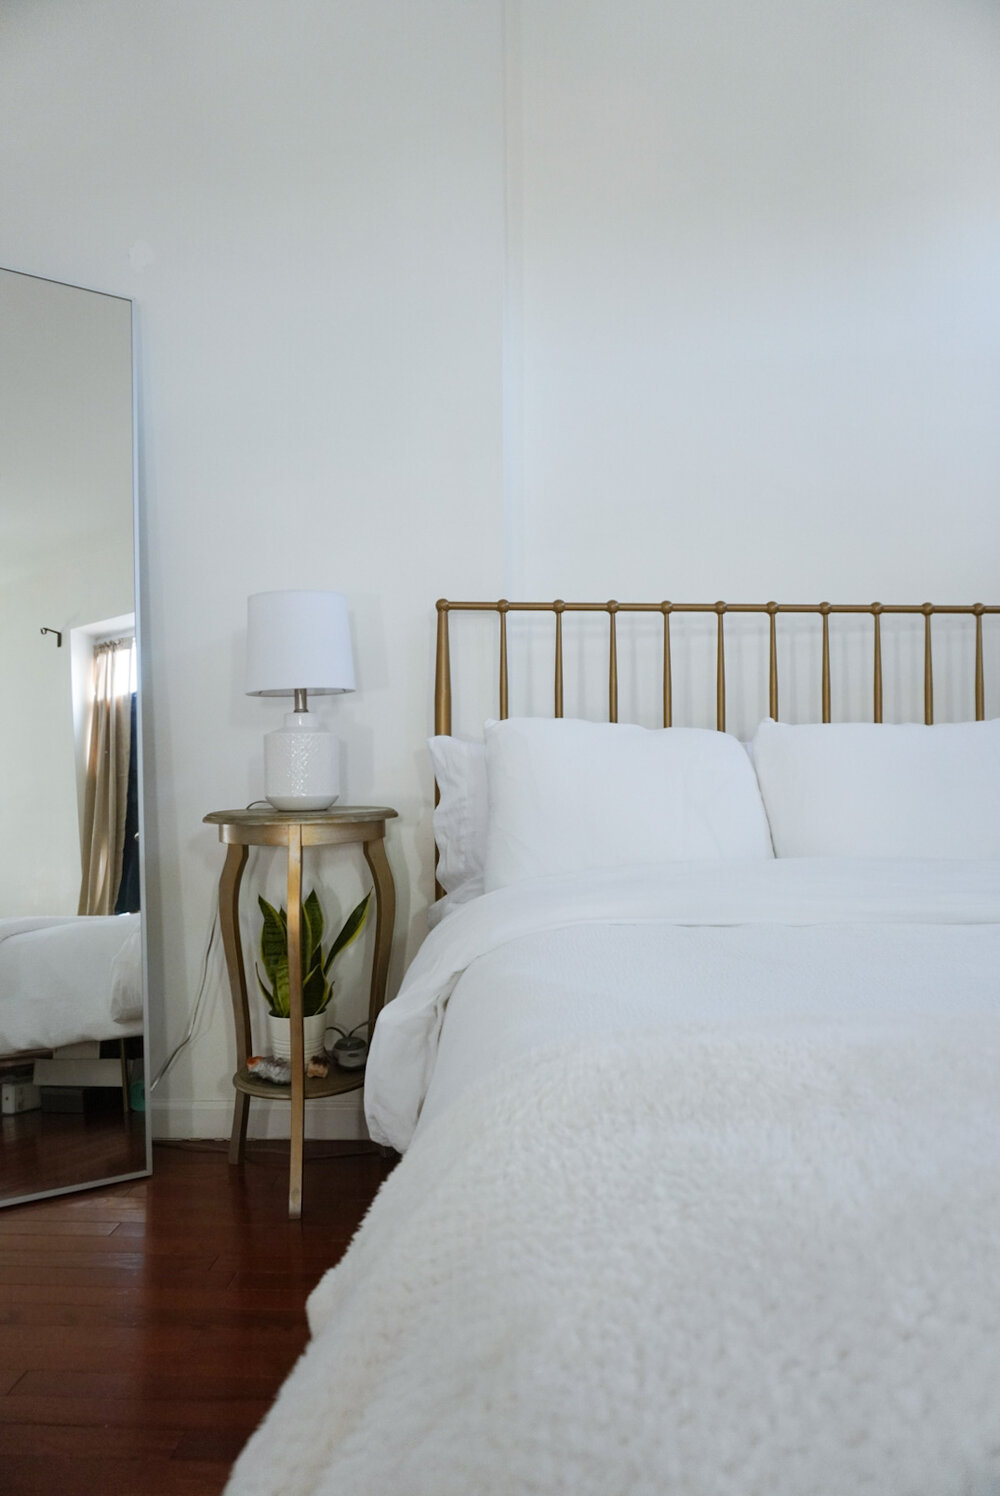 Bedroom Tour & Decor Haul (w/ Links!) — Christine Celine